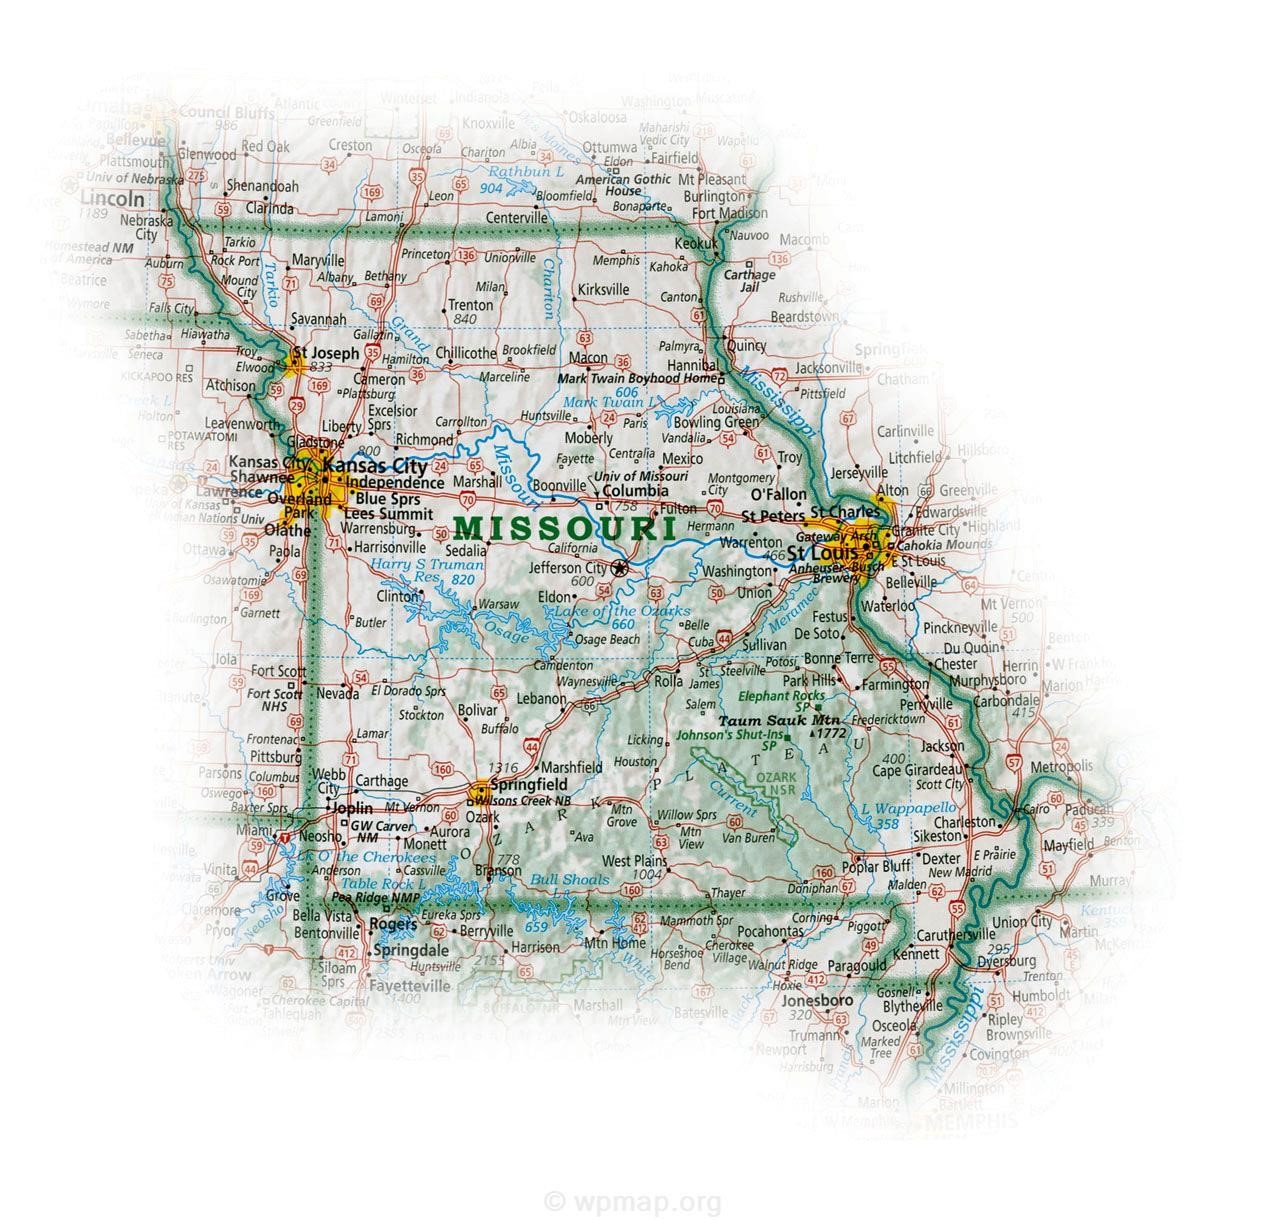 0126 Maps1 Jpg